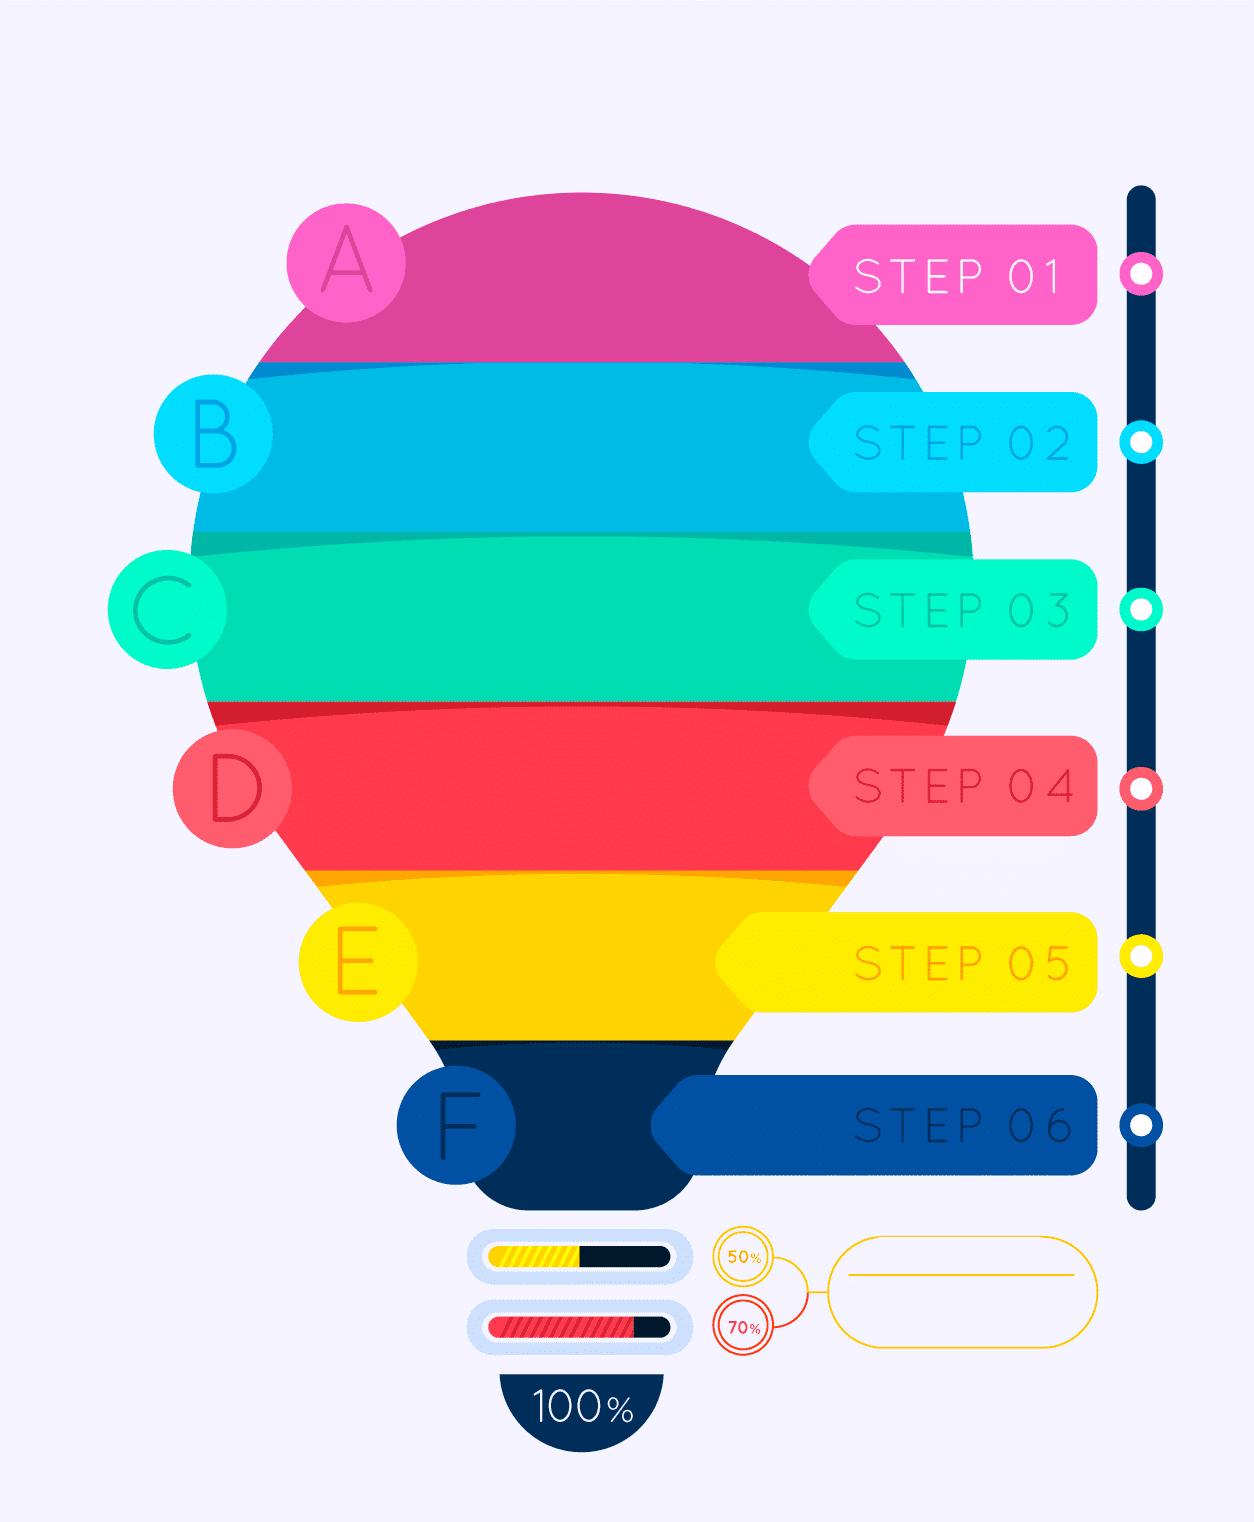 نمودار بالونی